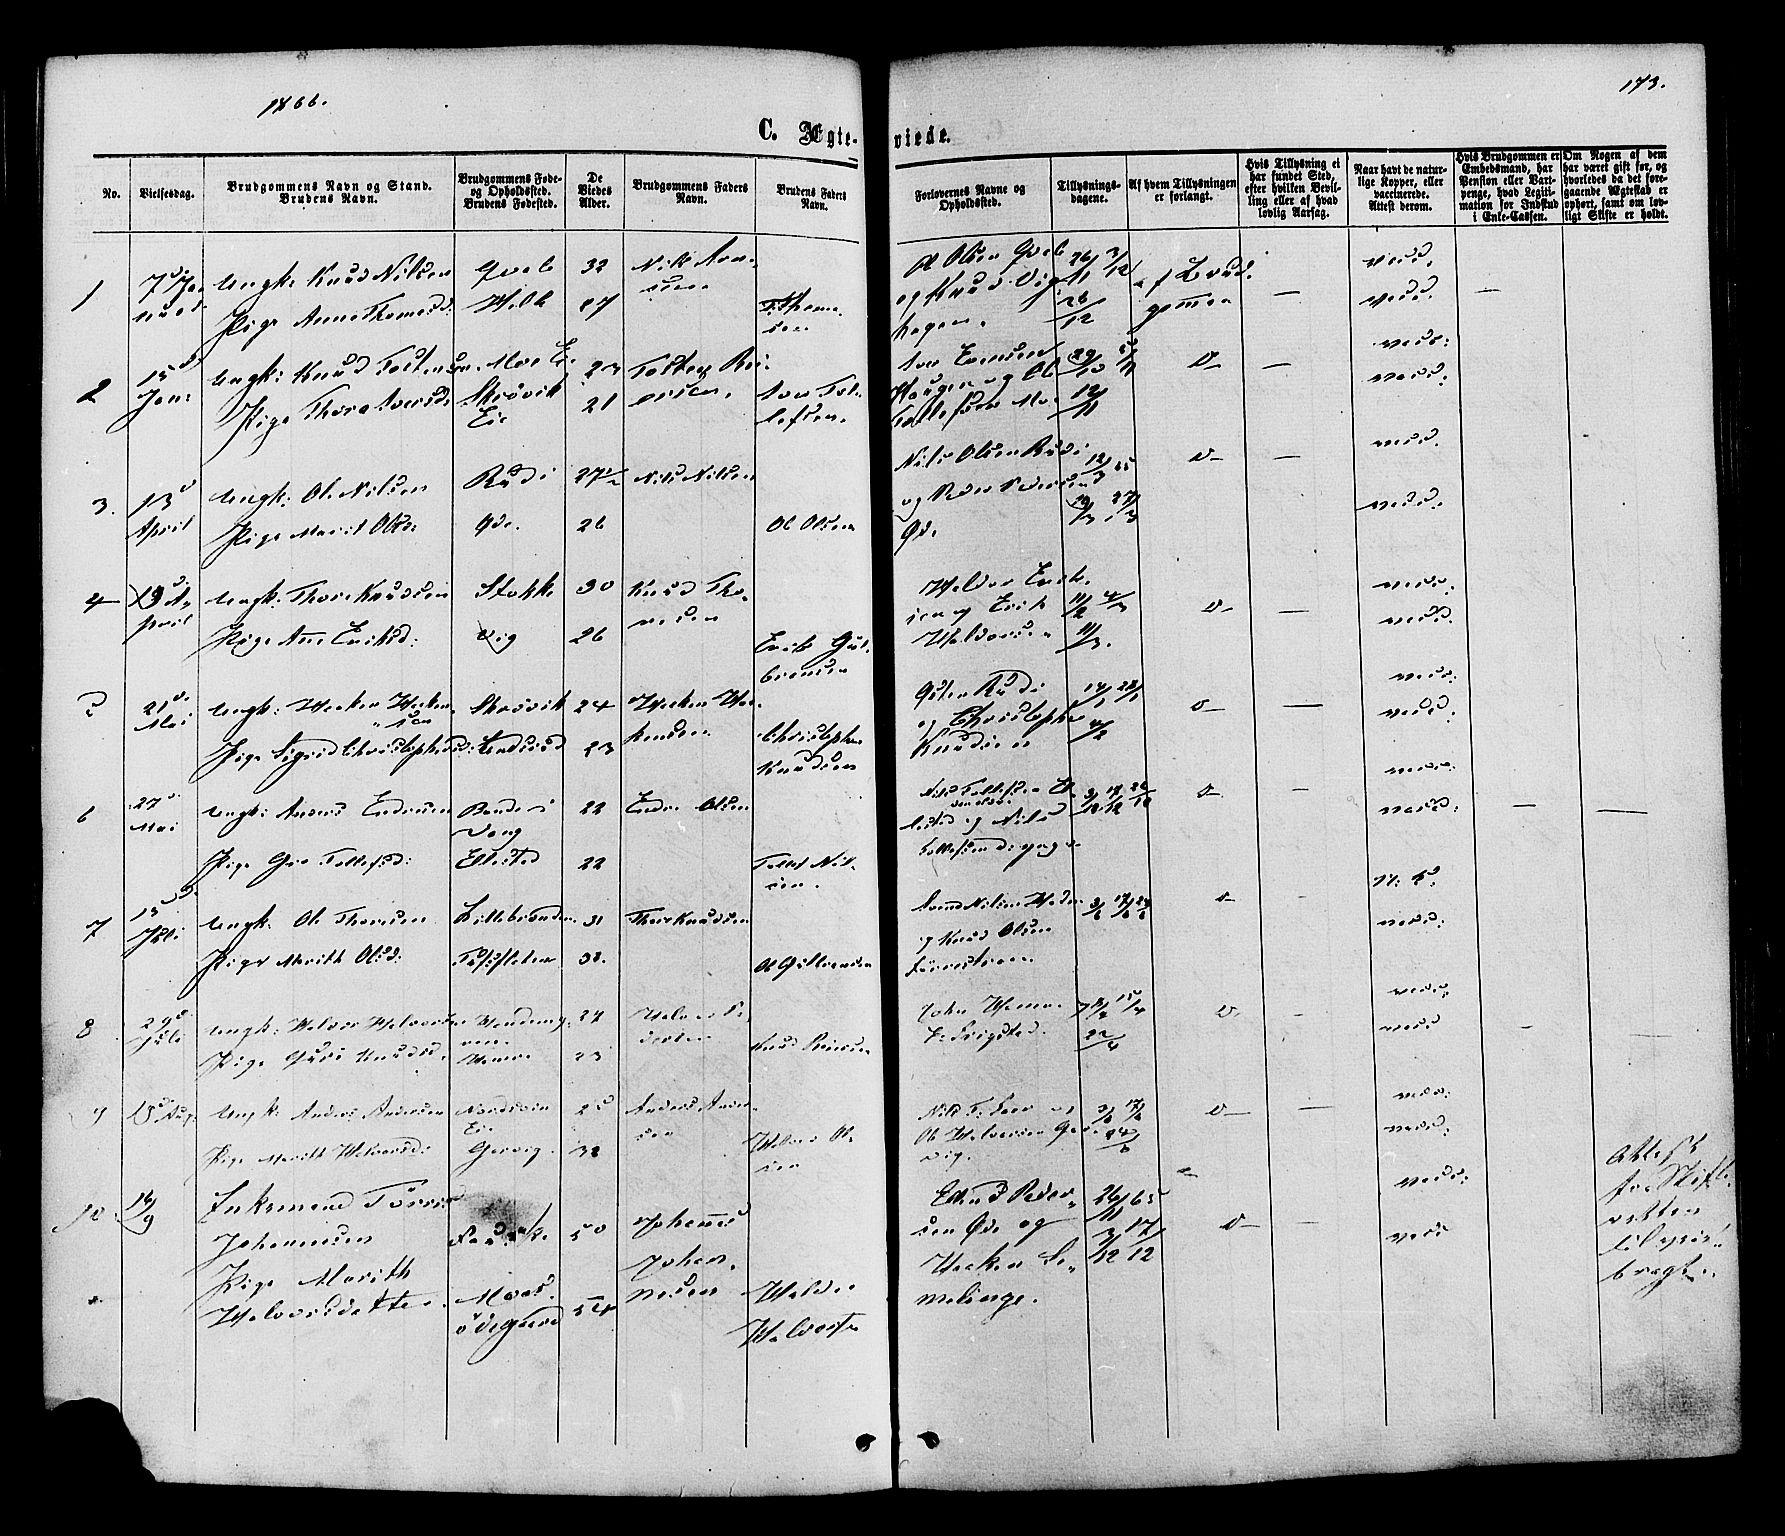 SAH, Vestre Slidre prestekontor, Ministerialbok nr. 3, 1865-1880, s. 173